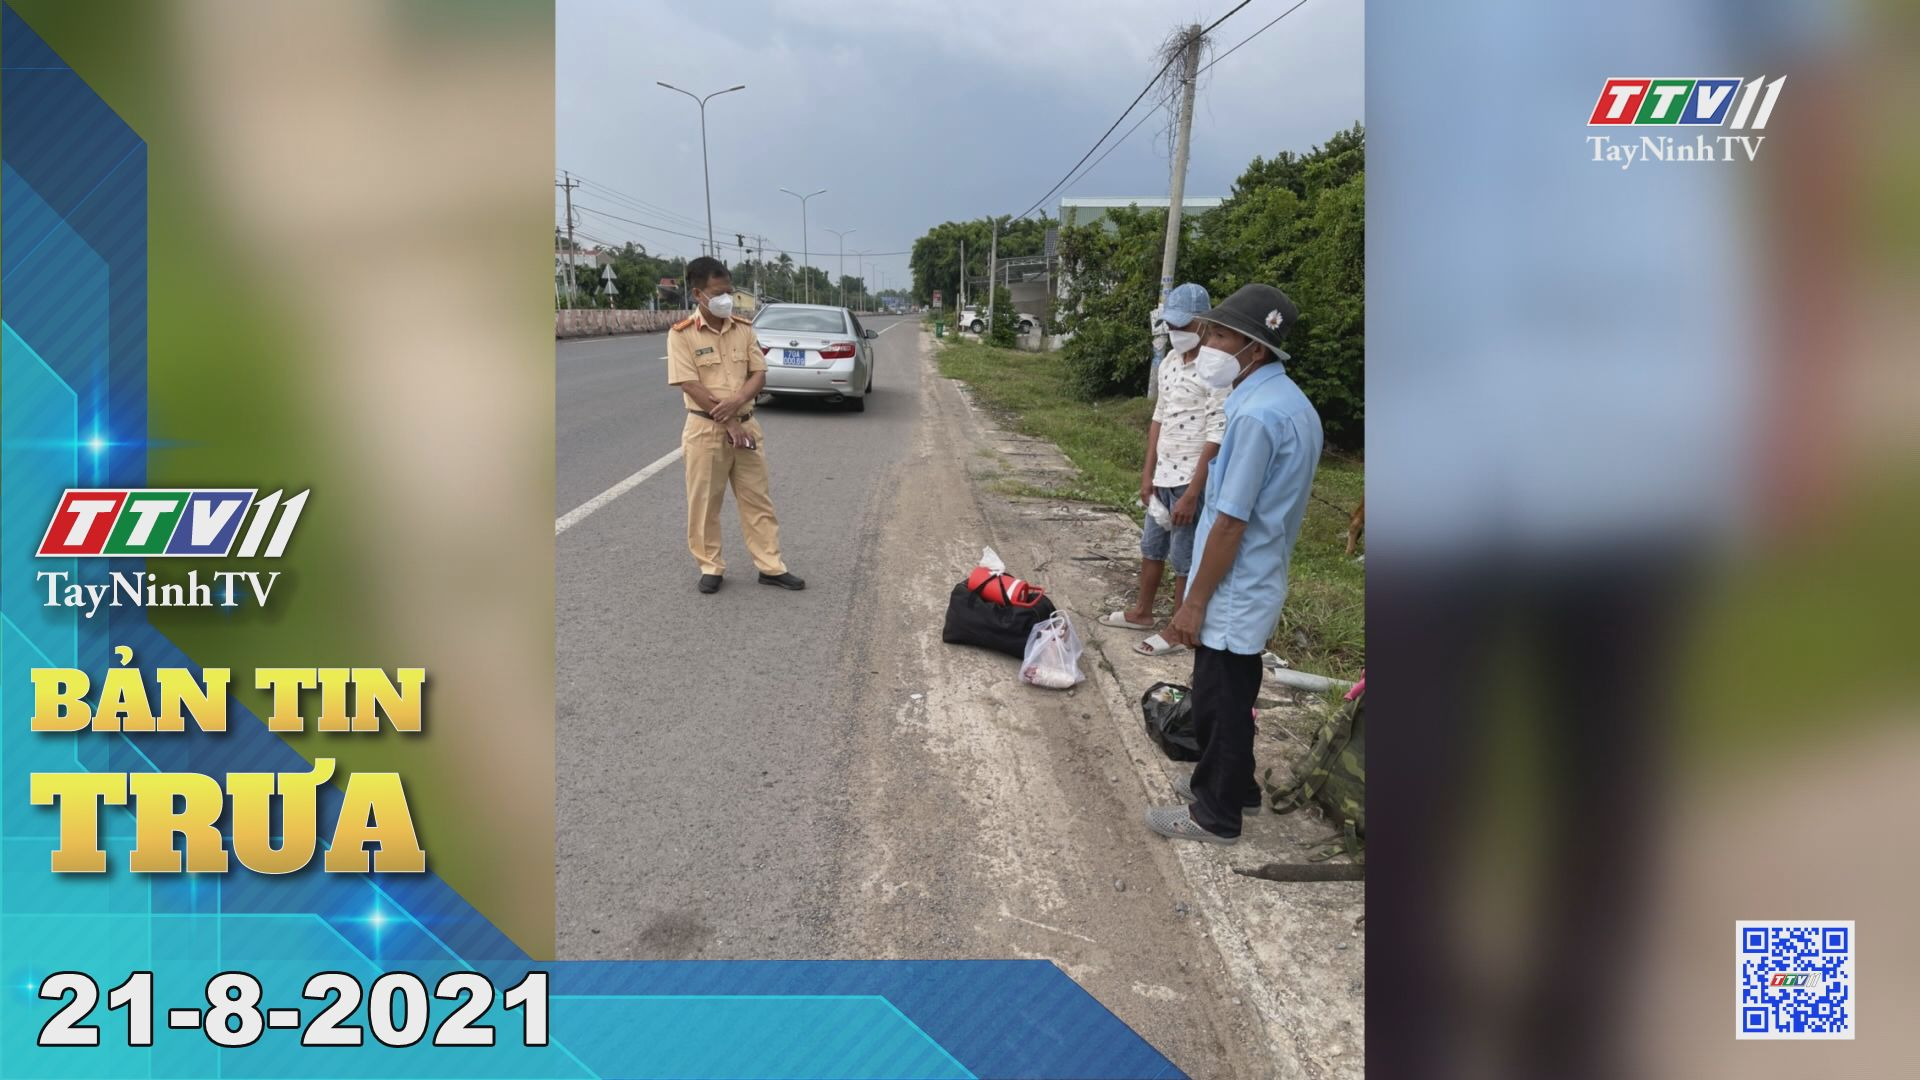 Bản tin trưa 21-8-2021 | Tin tức hôm nay | TayNinhTV